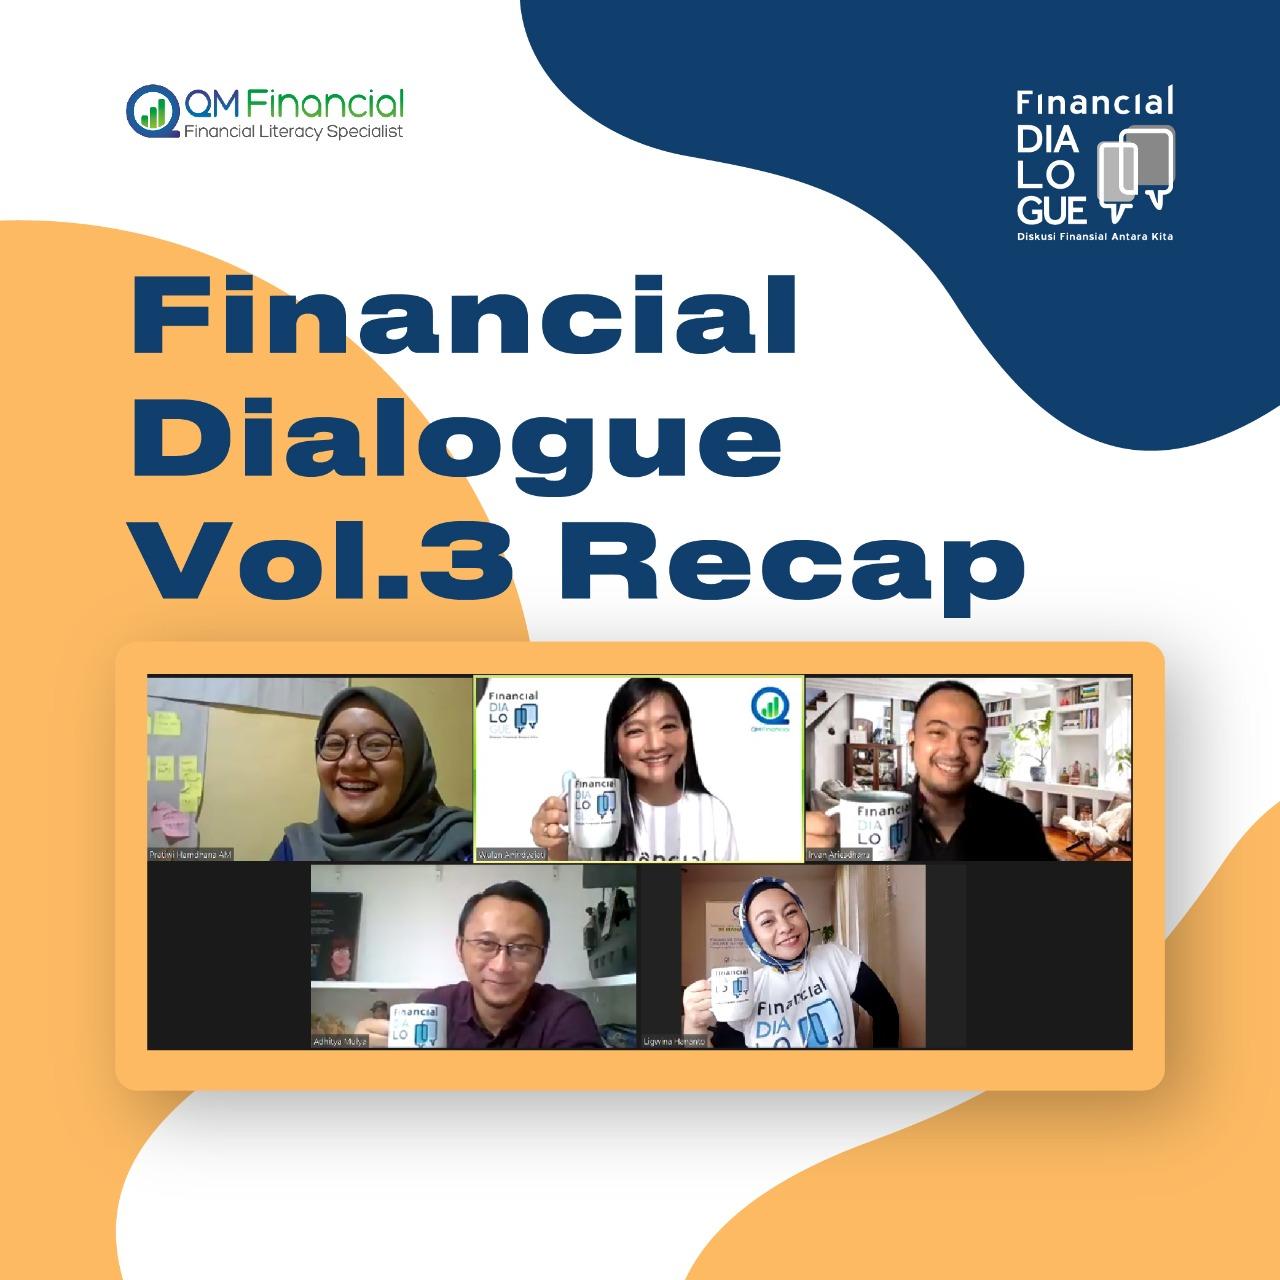 Financial Dialogue 03: Wujudkan Mimpi Punya Properti di Usia Muda